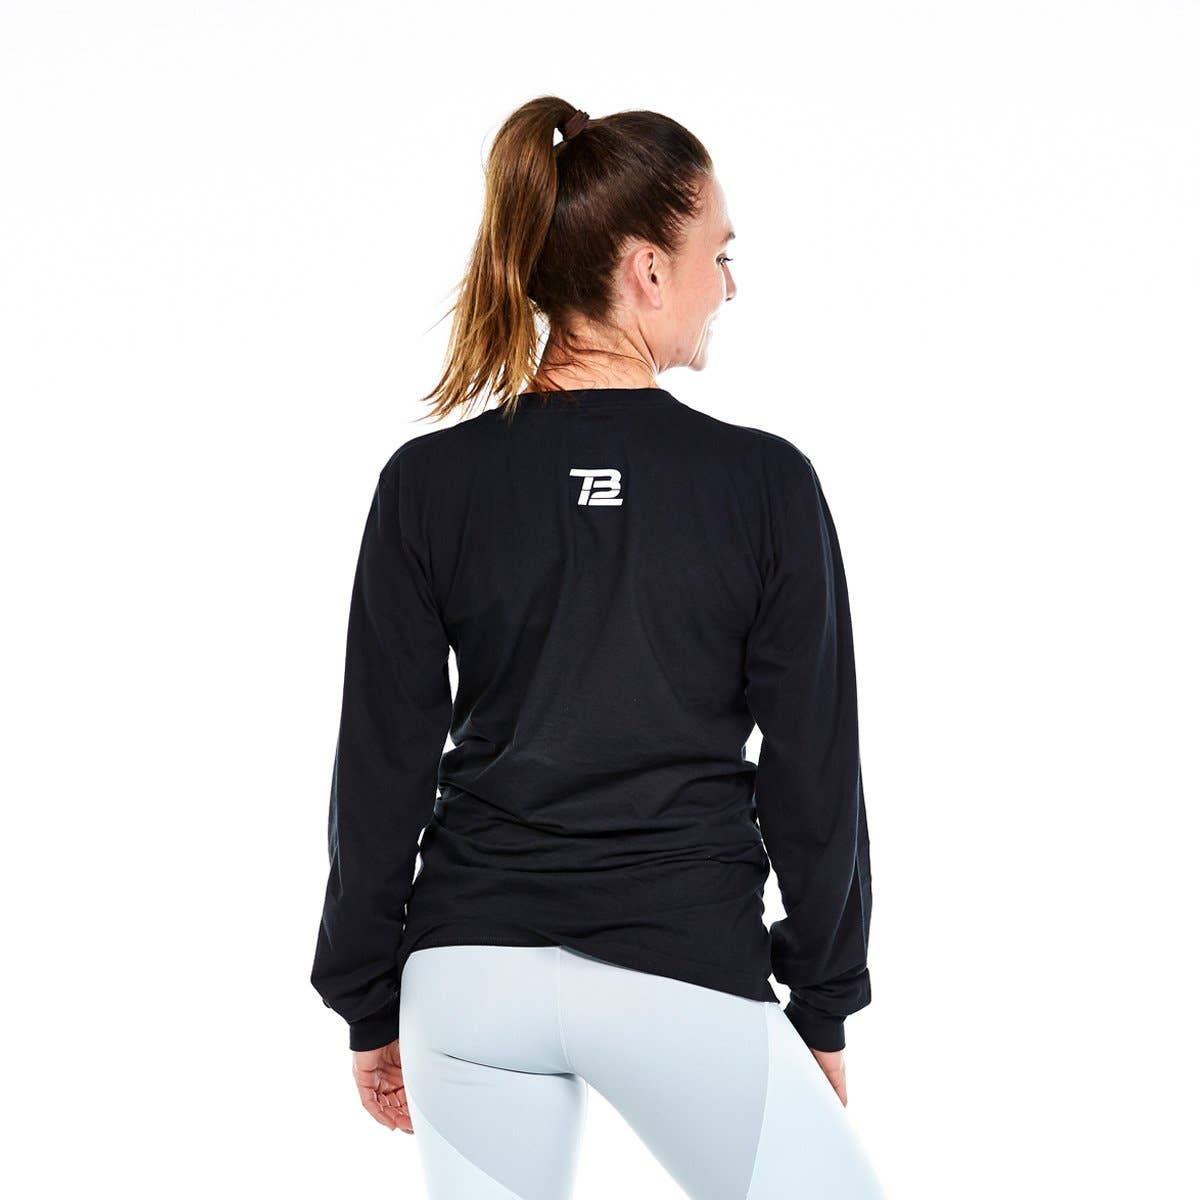 TB12™ Pliability Long-sleeved T-shirts